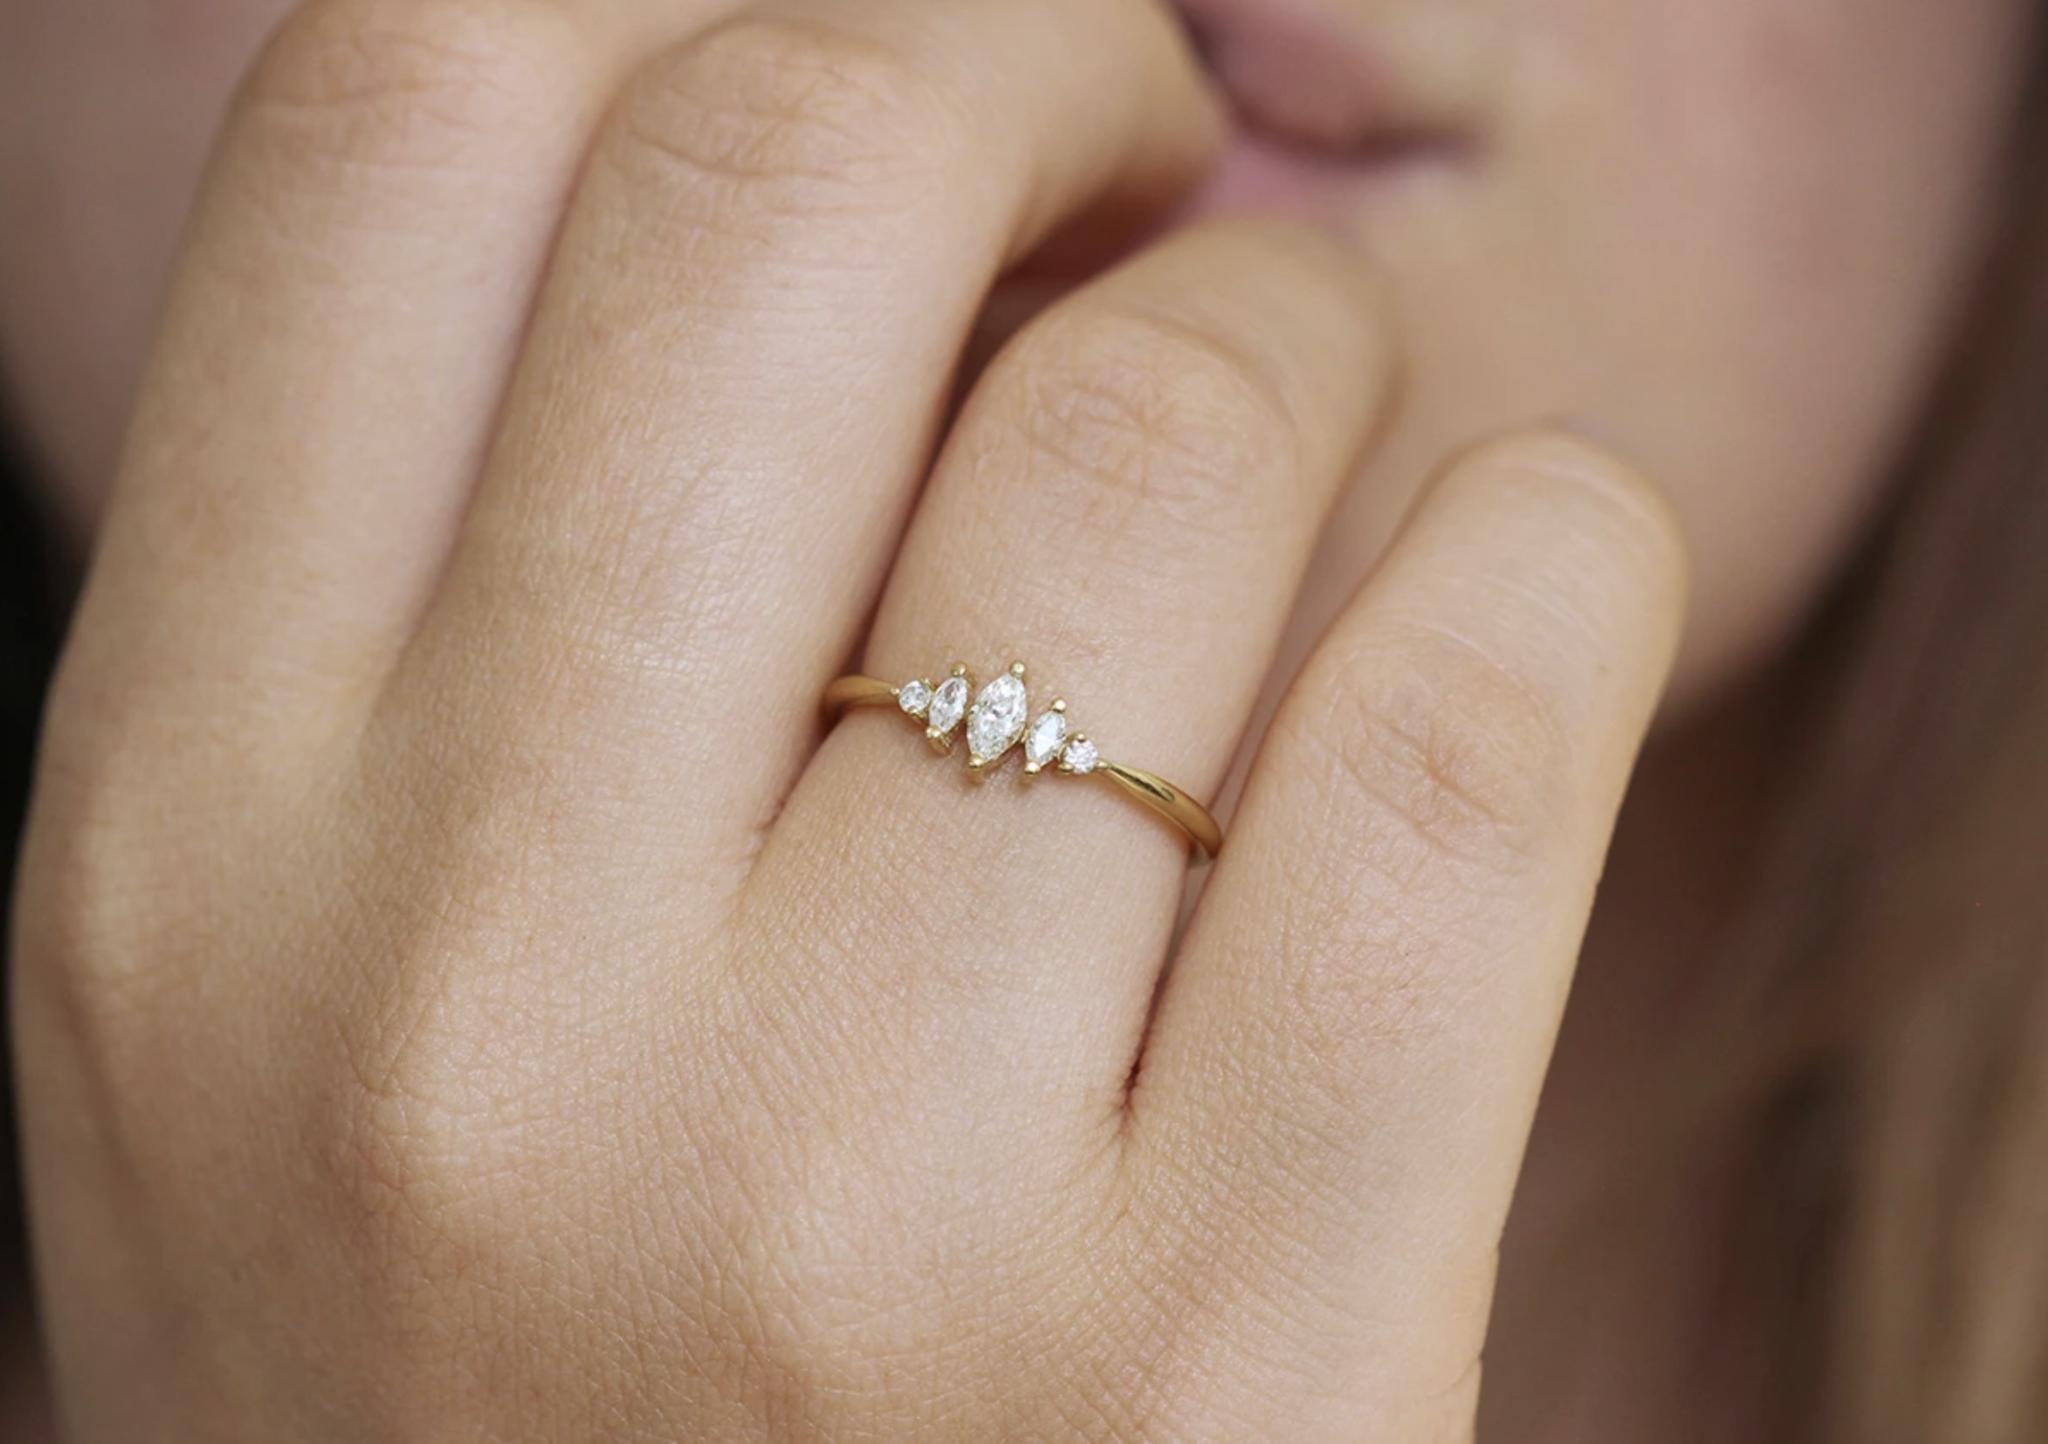 Artëmer Dainty Marquise Diamond Cluster Ring